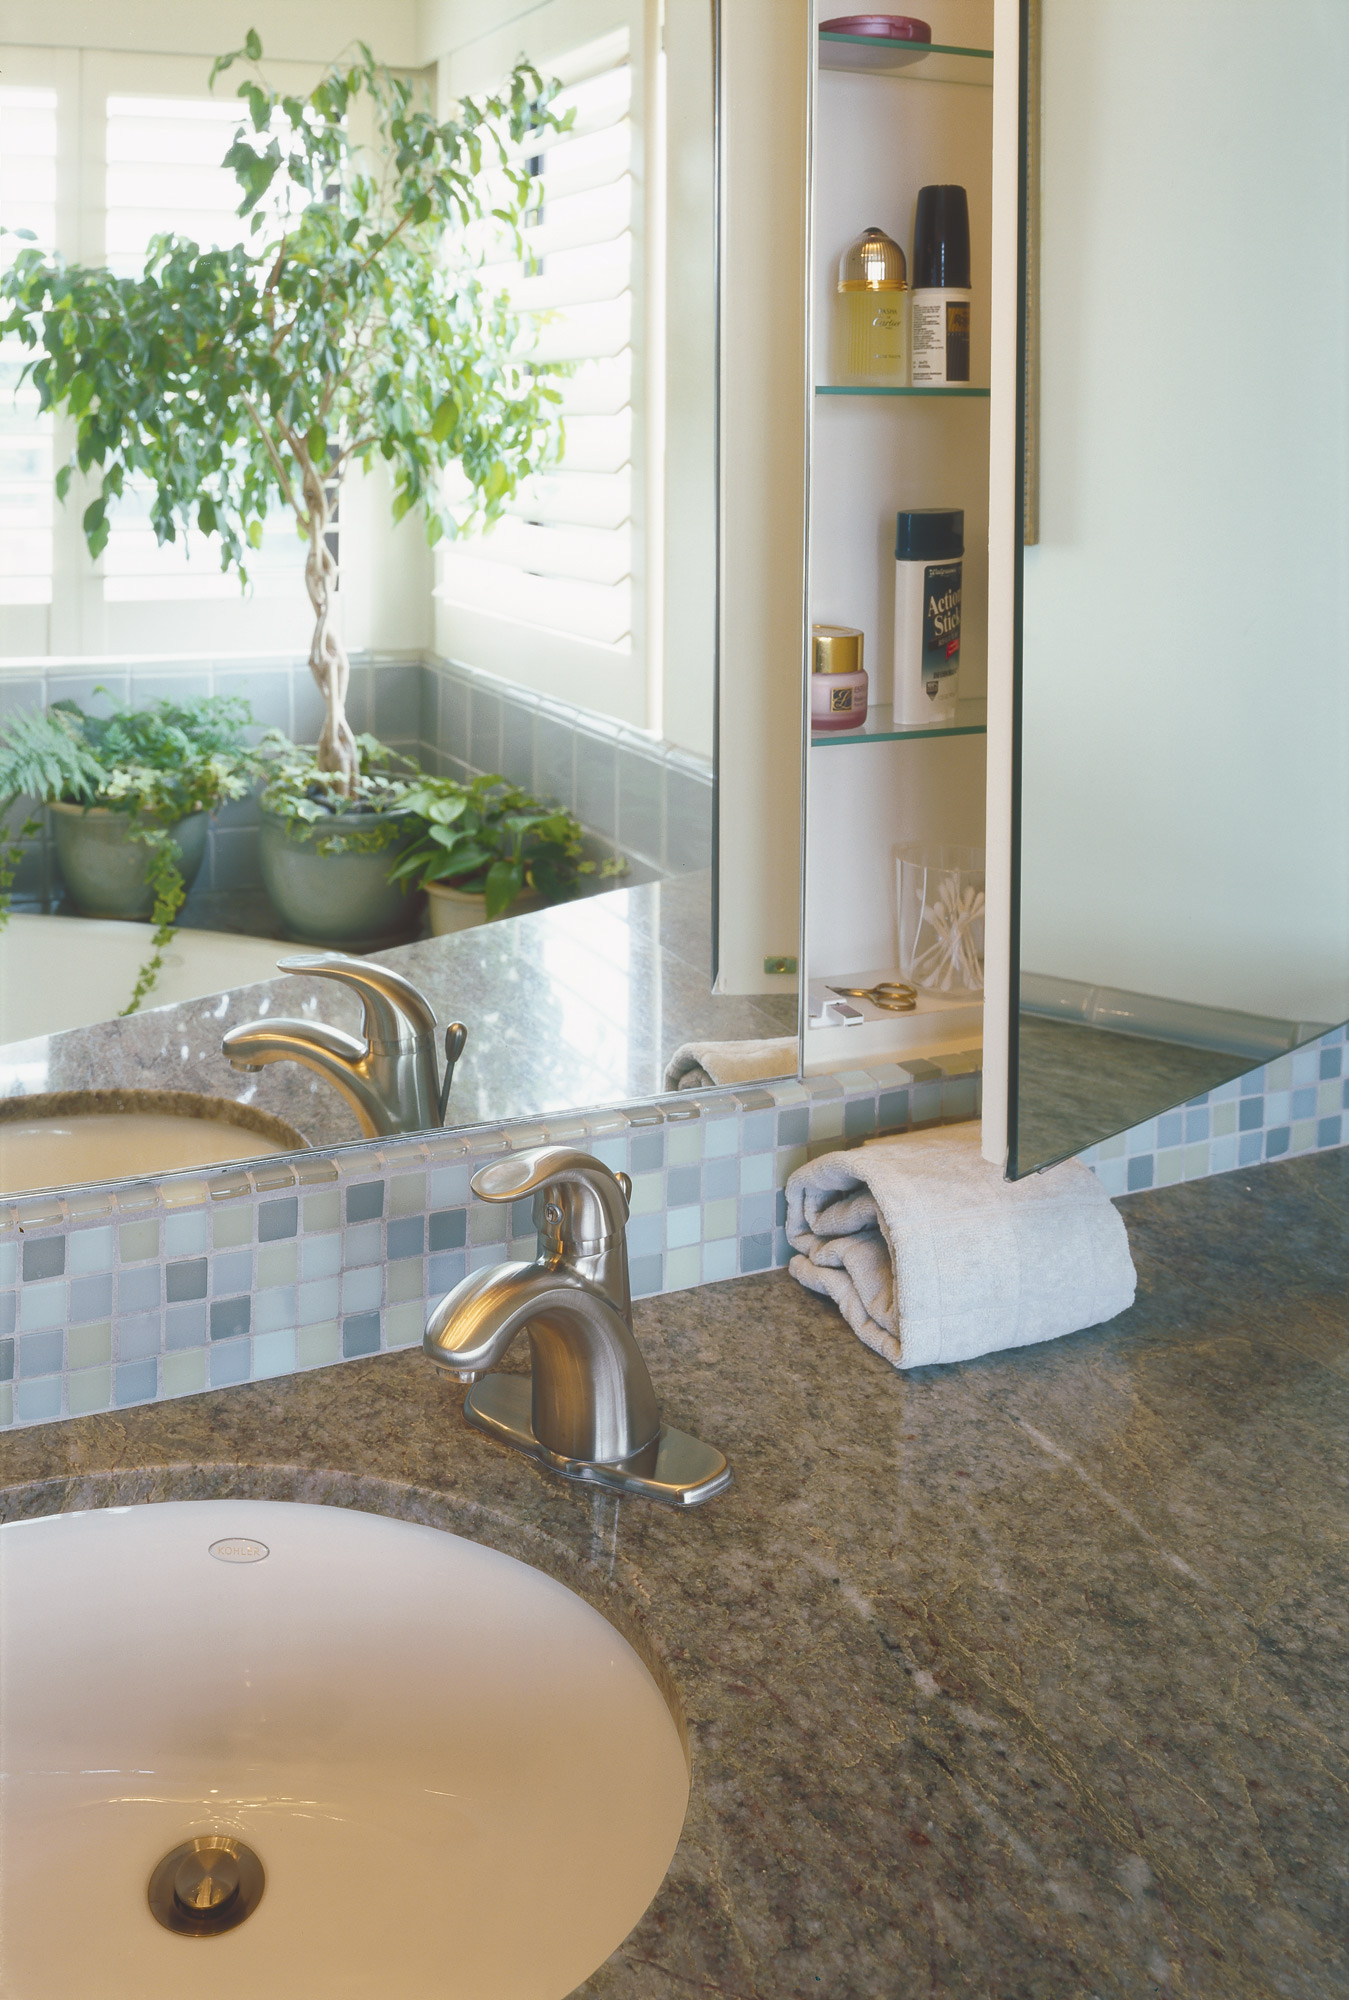 Kaplan-Architects-San Francisco-master-bath-remodel-vanity.jpg